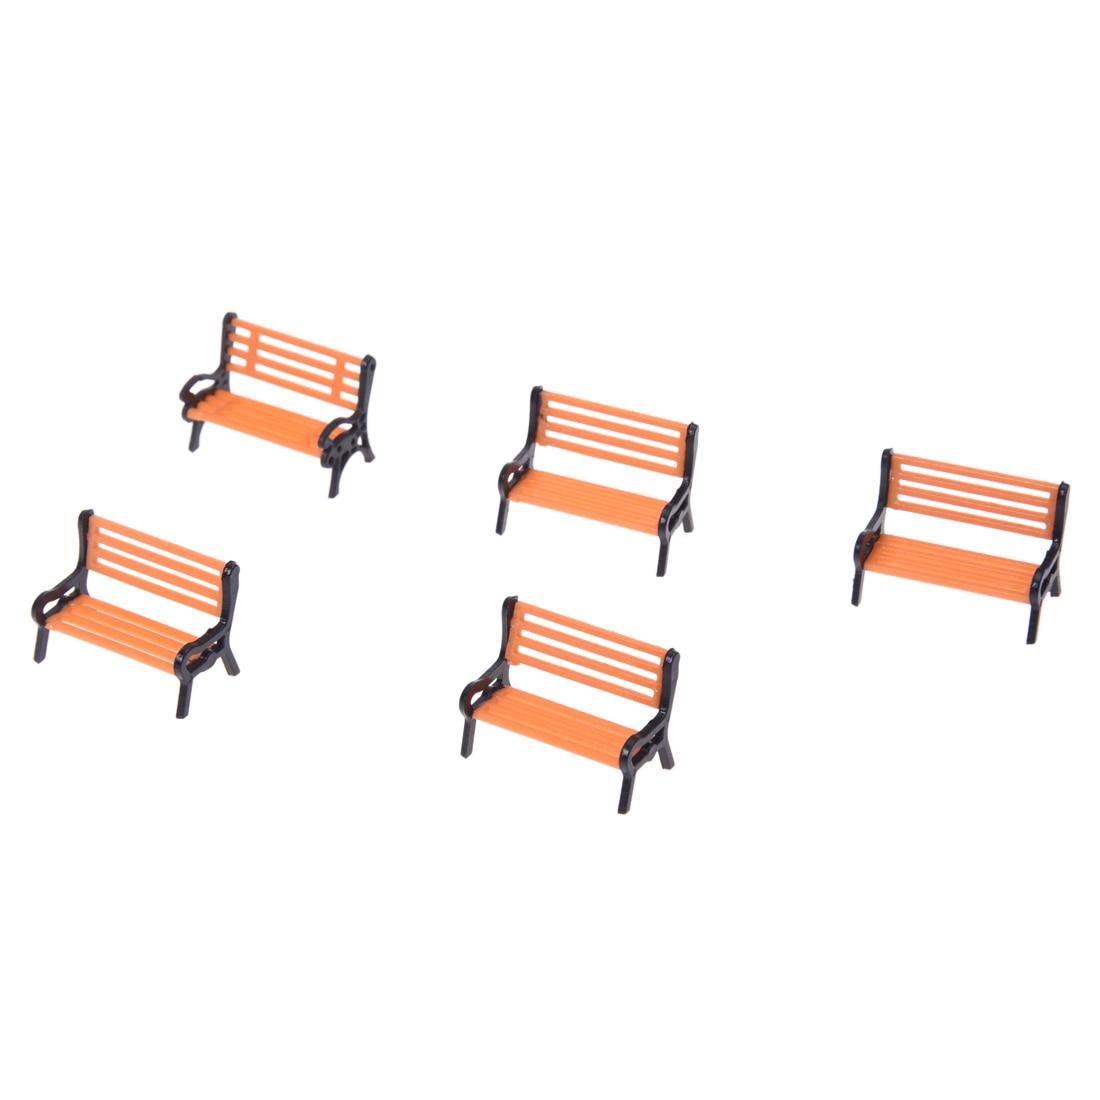 5pcs Model Train Platform Park Street Seats Bench Chair Settee 1: 50 Scale  Courtyard Chairs Railway Modeling